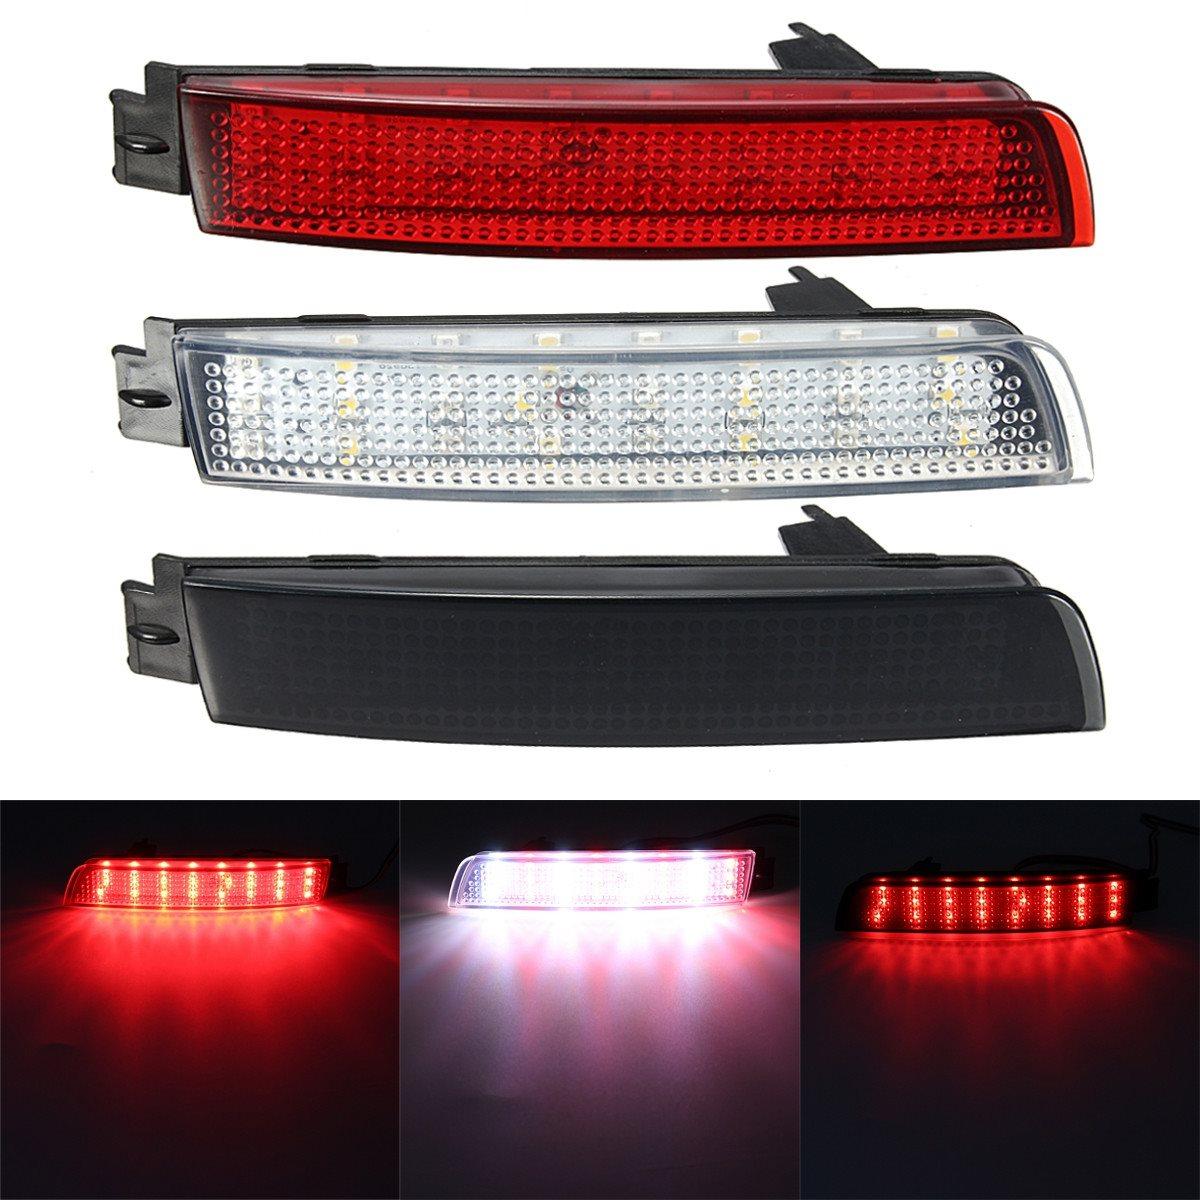 2 unids LED parachoques Reflector rojo lente freno de la cola de la lámpara de luz para Nissan Juke/Murano/Infiniti FX35/FX37/FX50